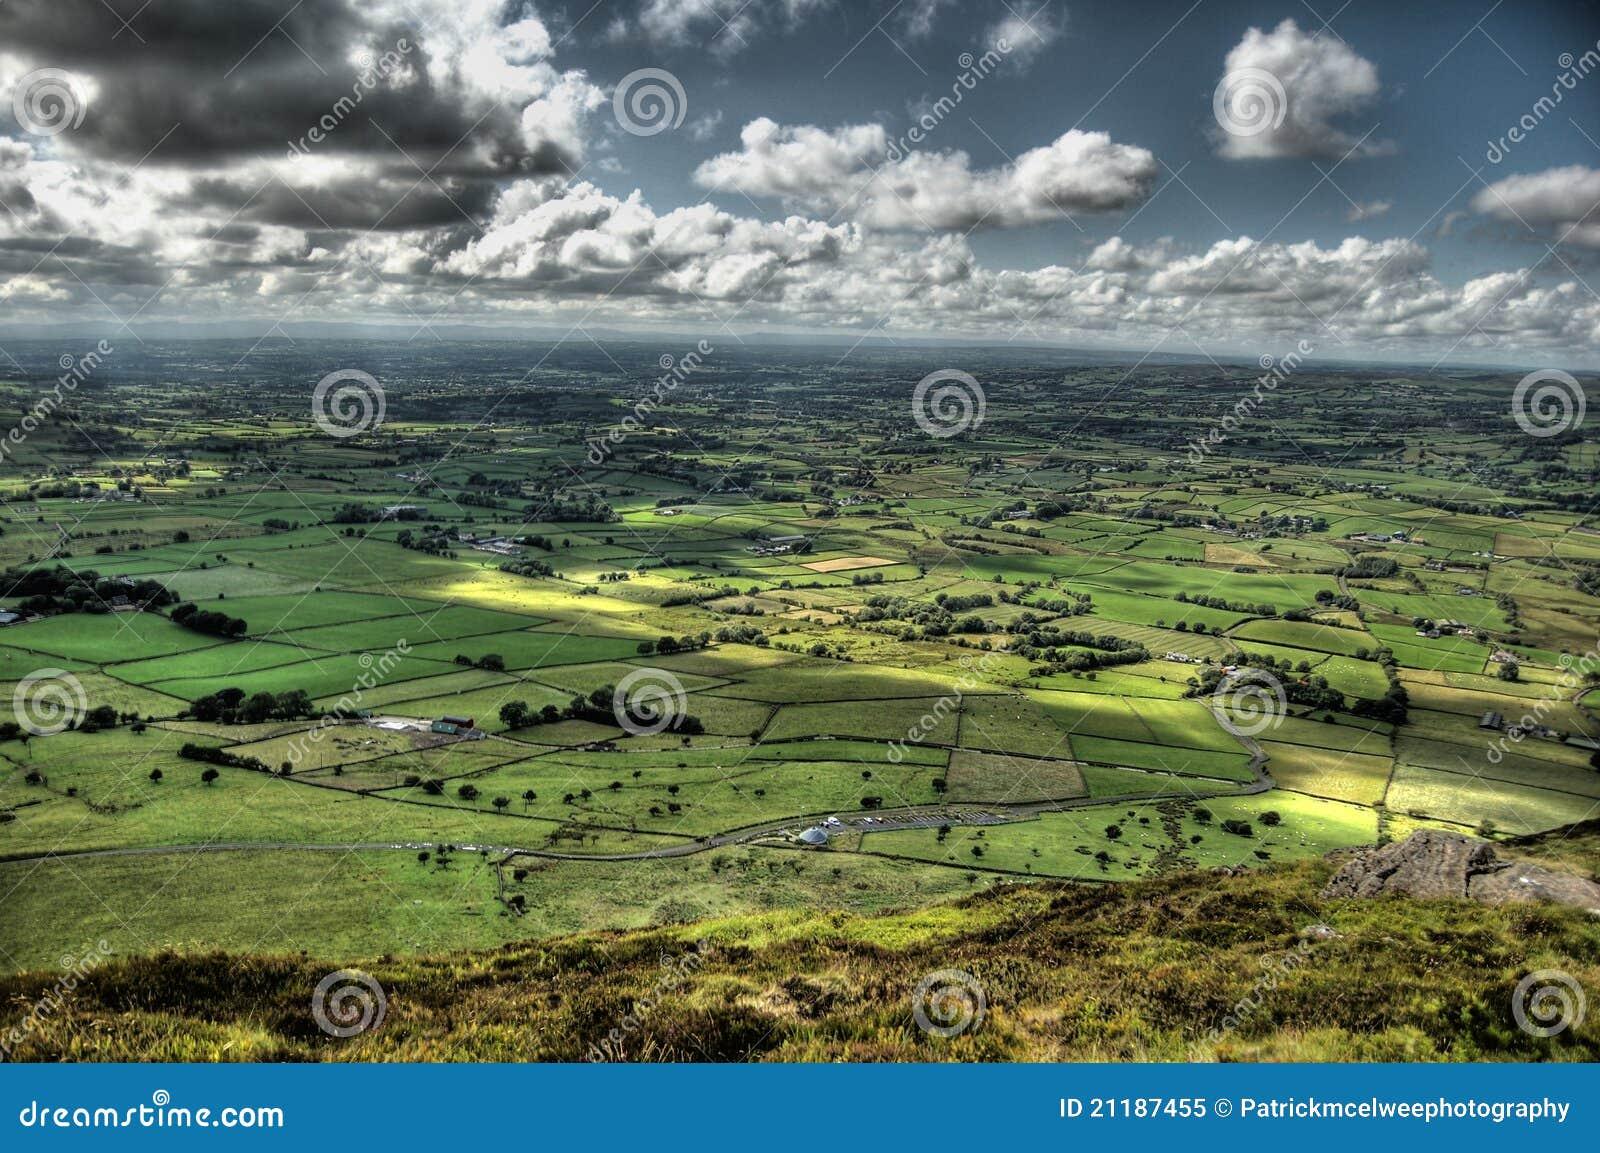 slemish mountain view royalty free stock photo